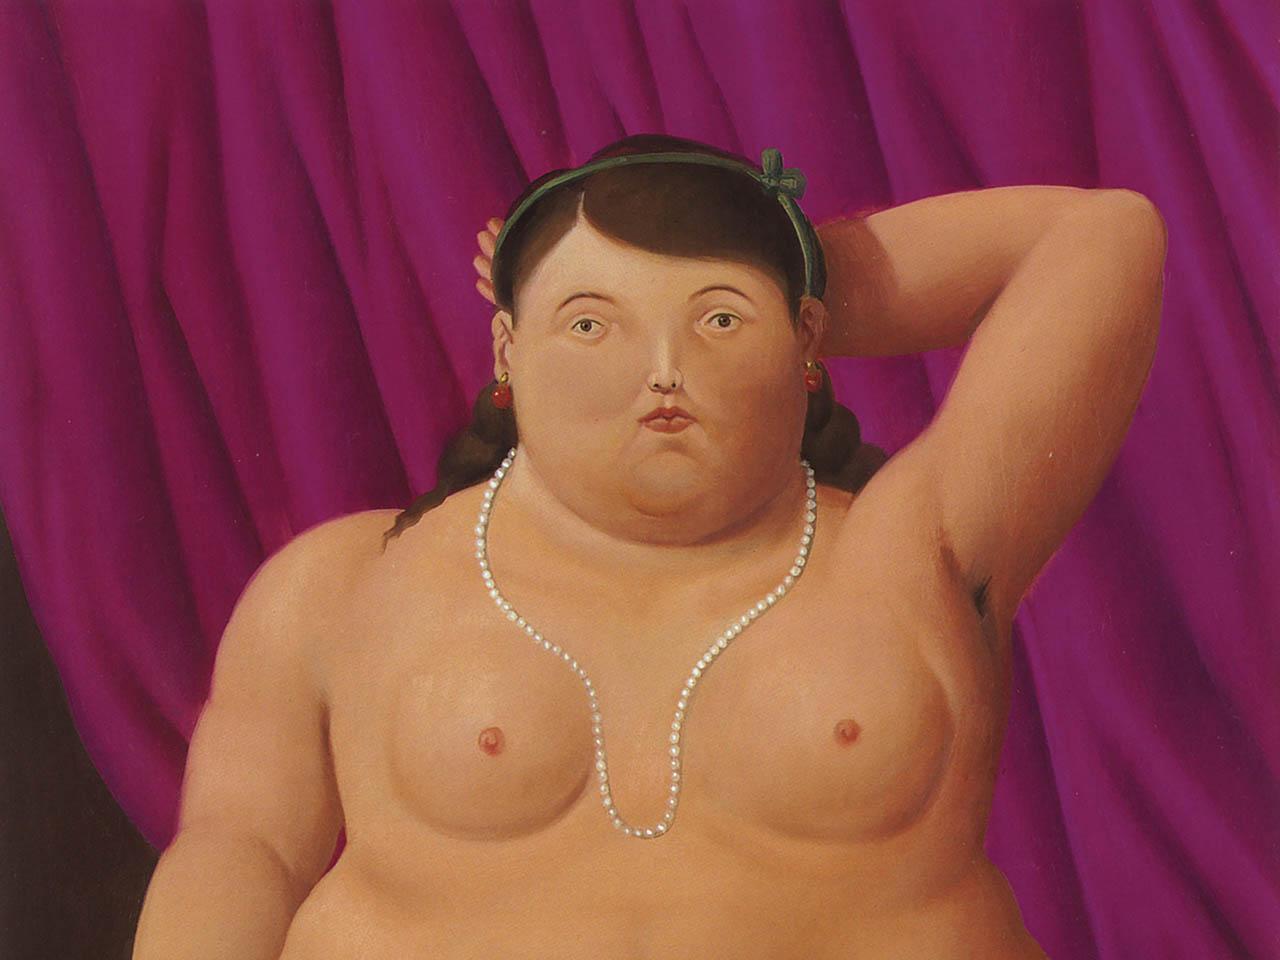 Botero, Donna seduta